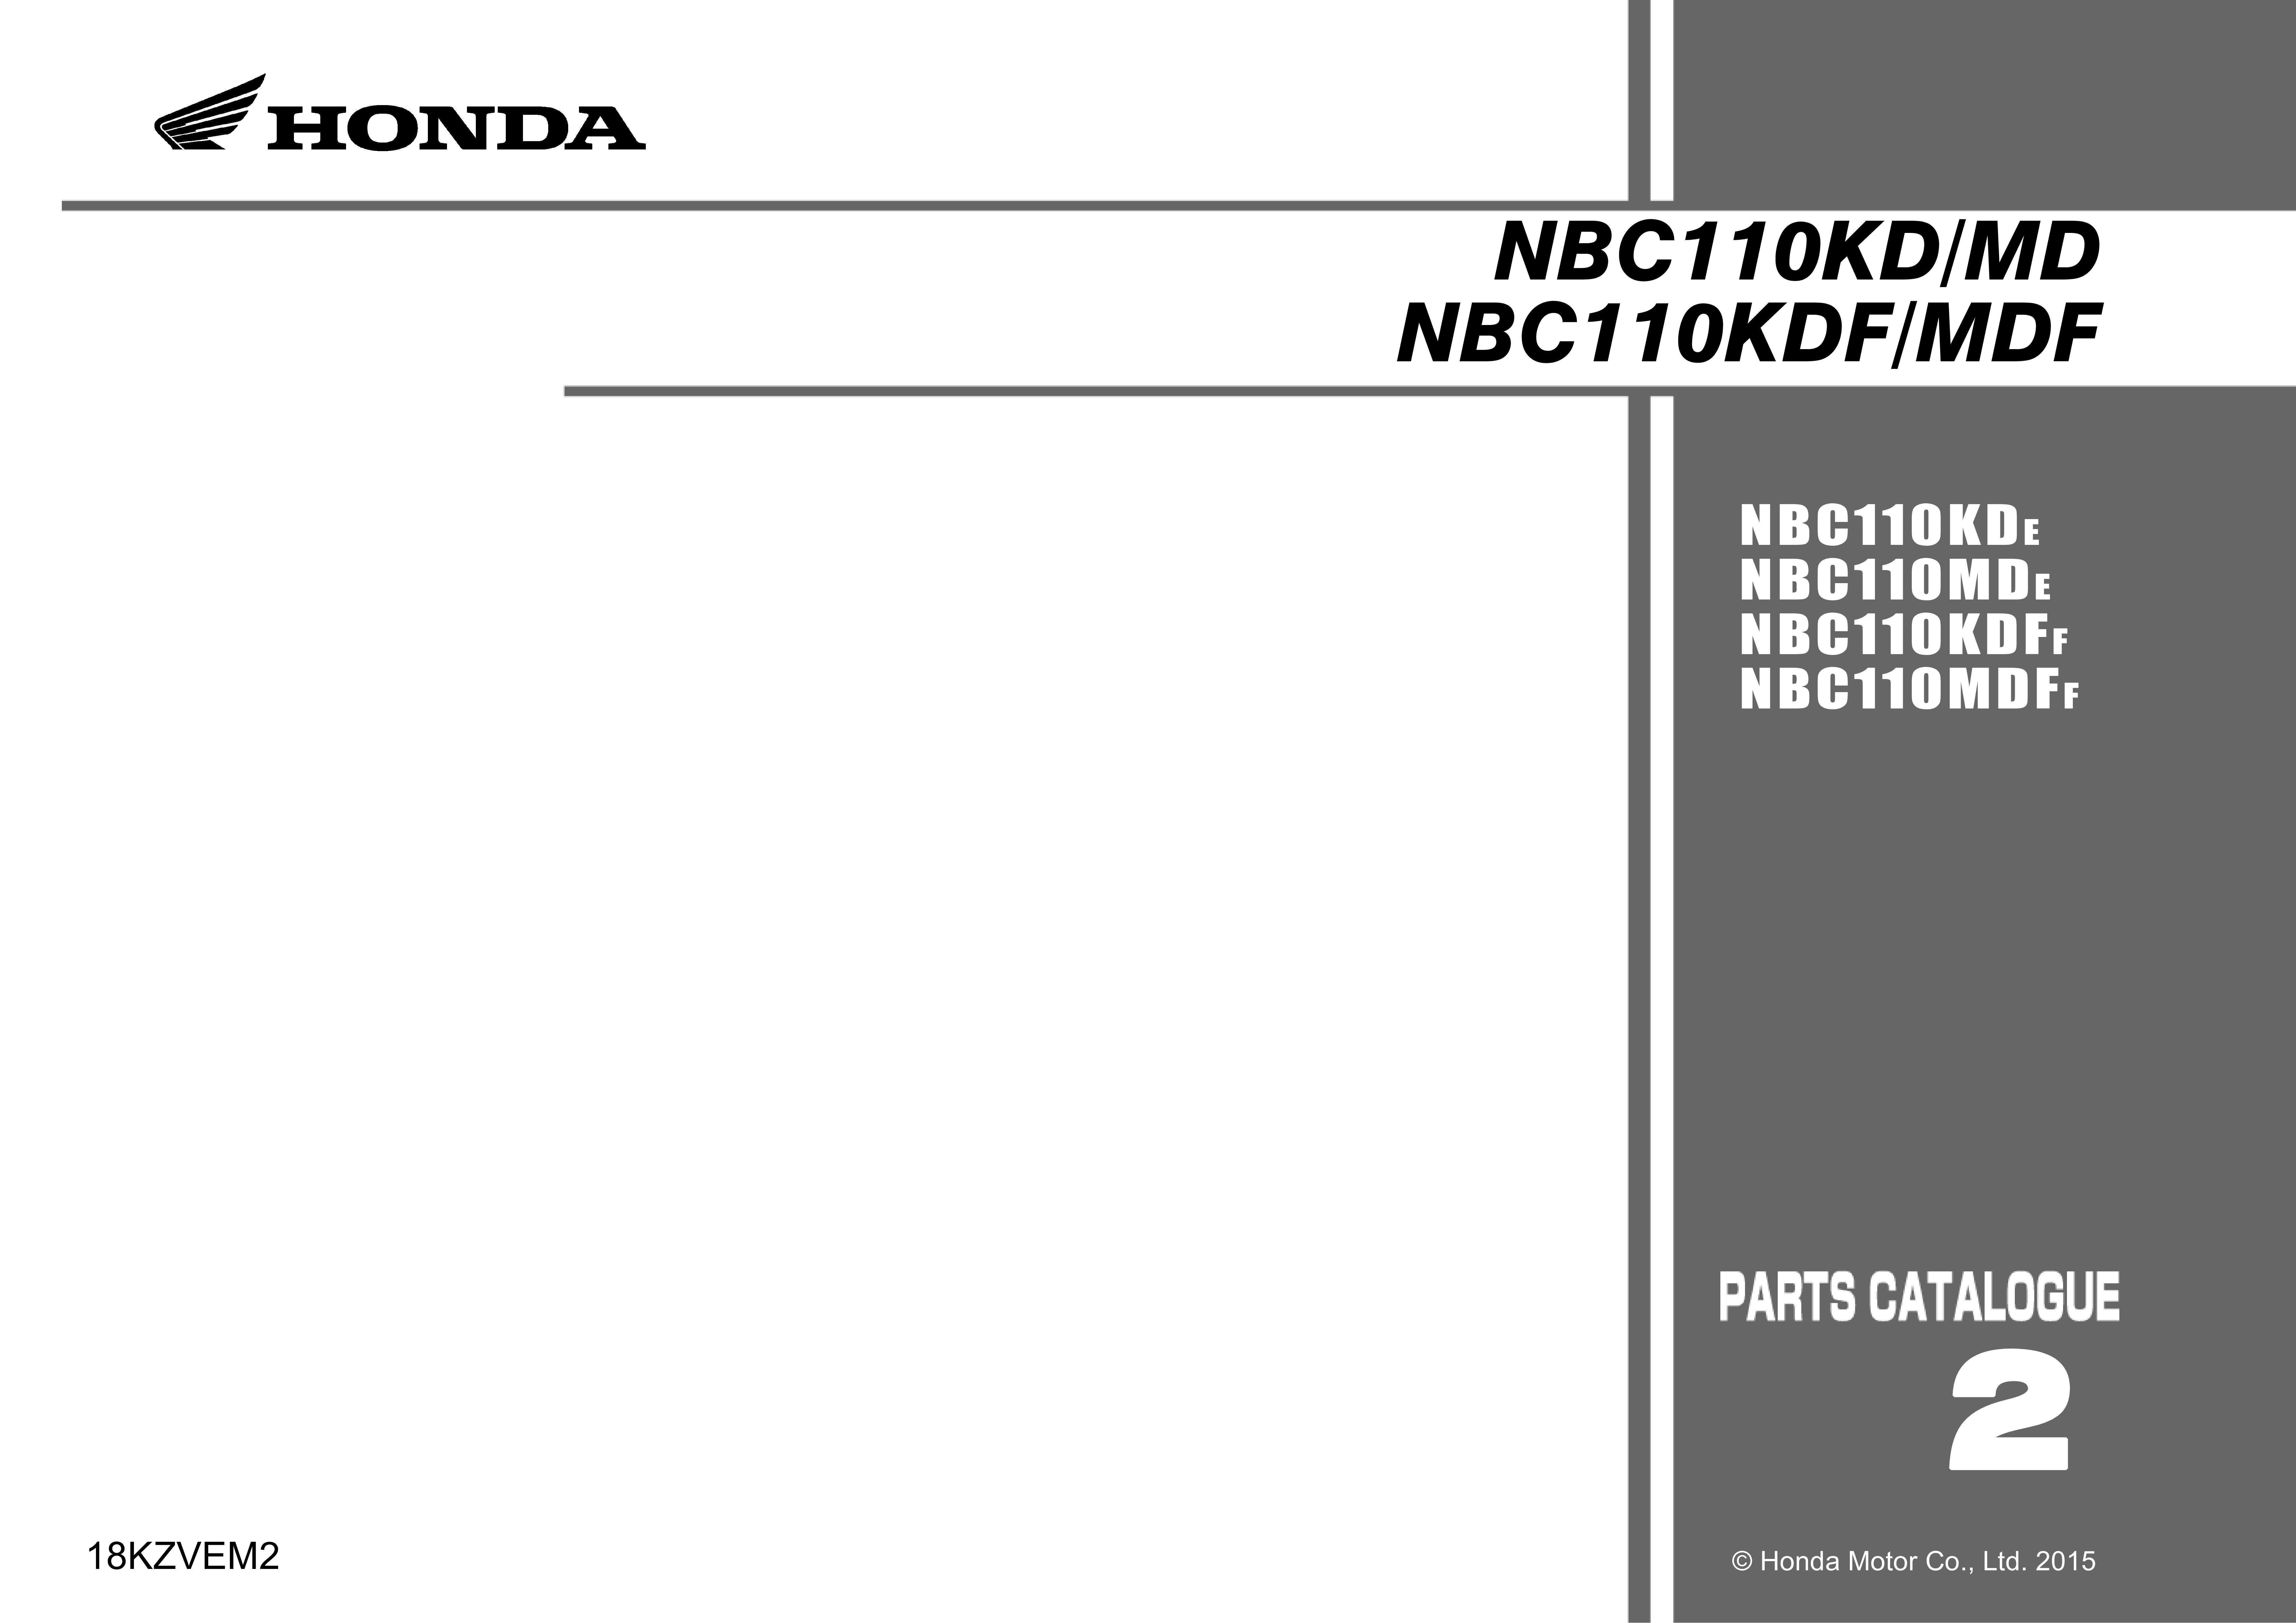 Parts List for Honda NBC110KDF Dream 110 (2015)